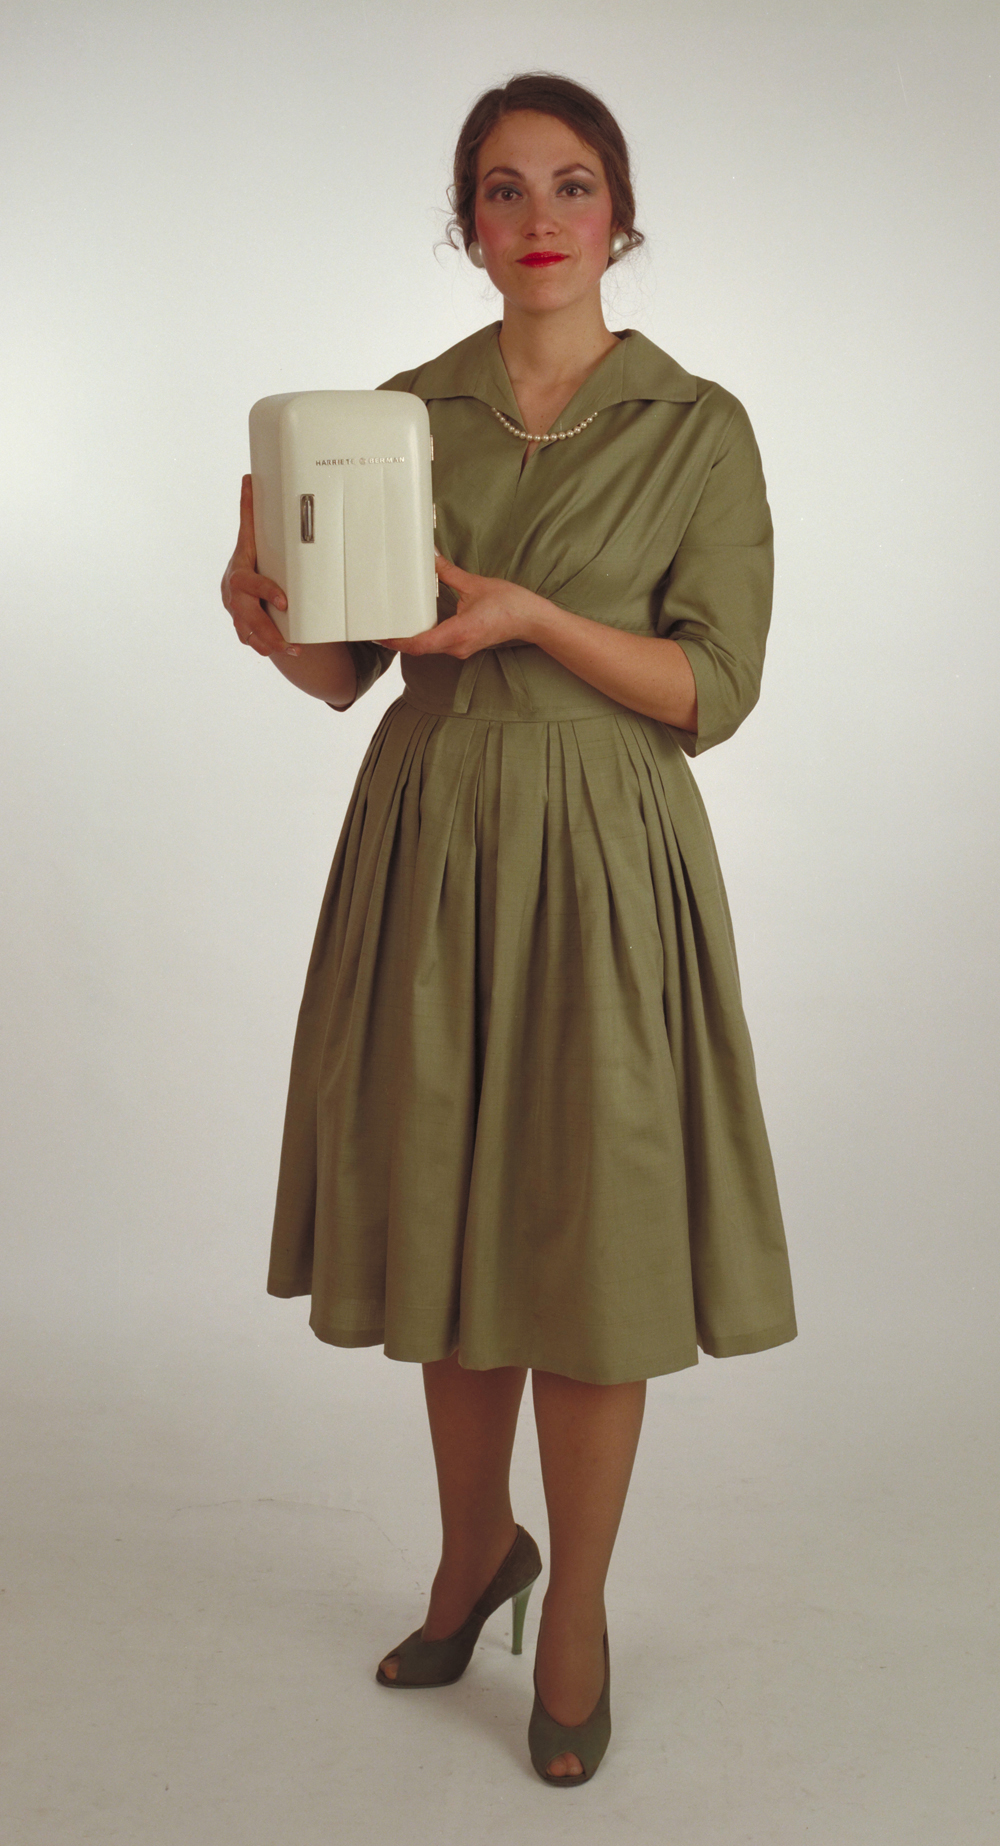 Harriete Estel Berman 1984 photographed as the Appliance Lady